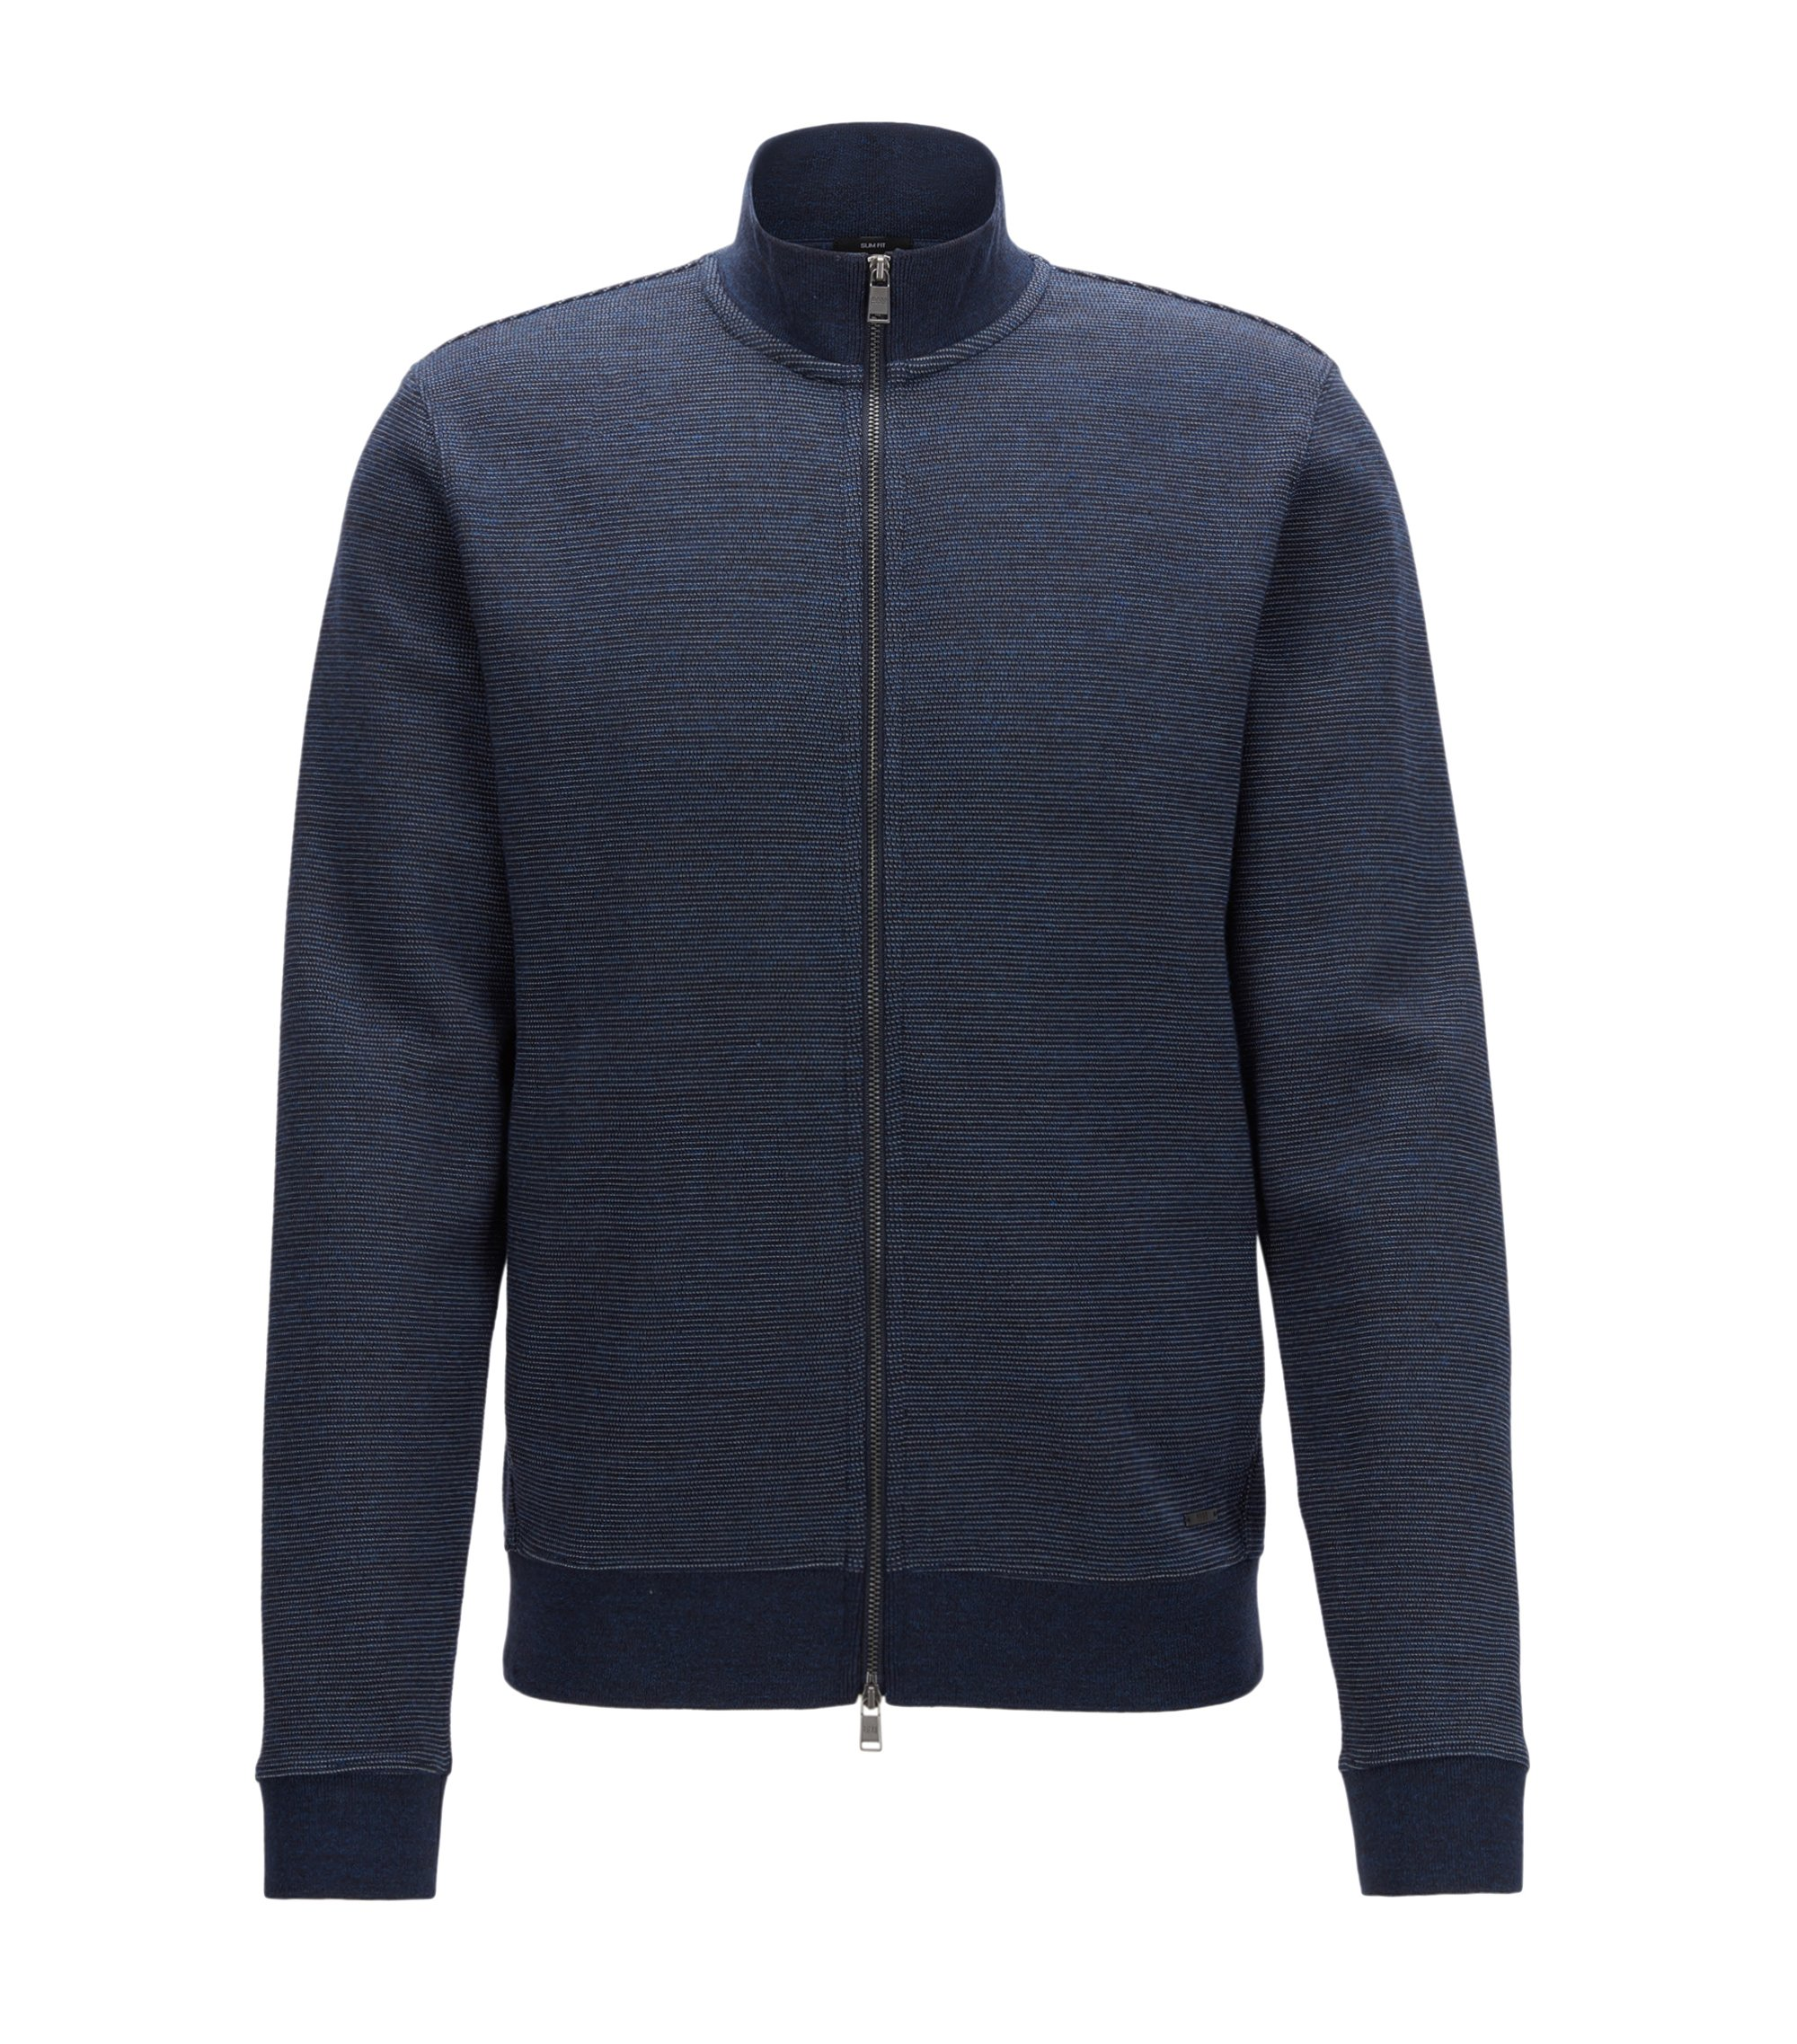 Slim-Fit Jacke aus zweifarbigem Baumwoll-Mix, Dunkelblau